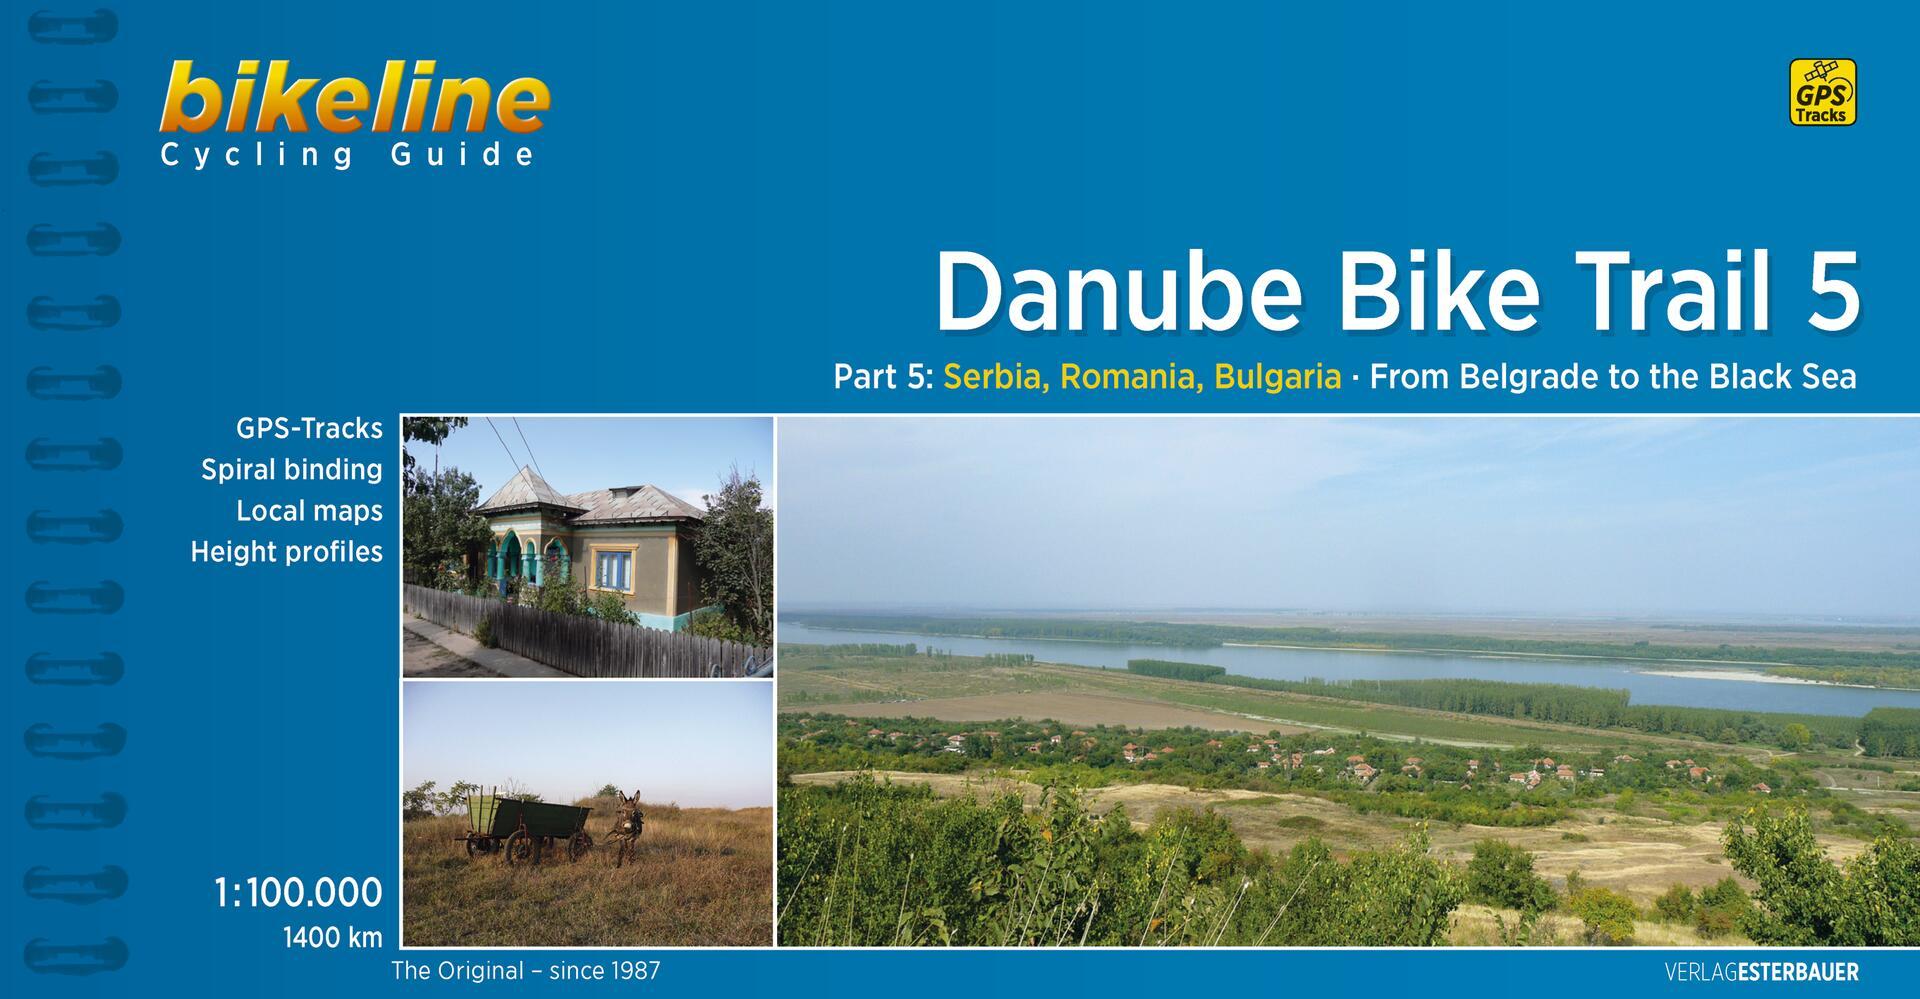 Foto vom Danube Bike Trail 5